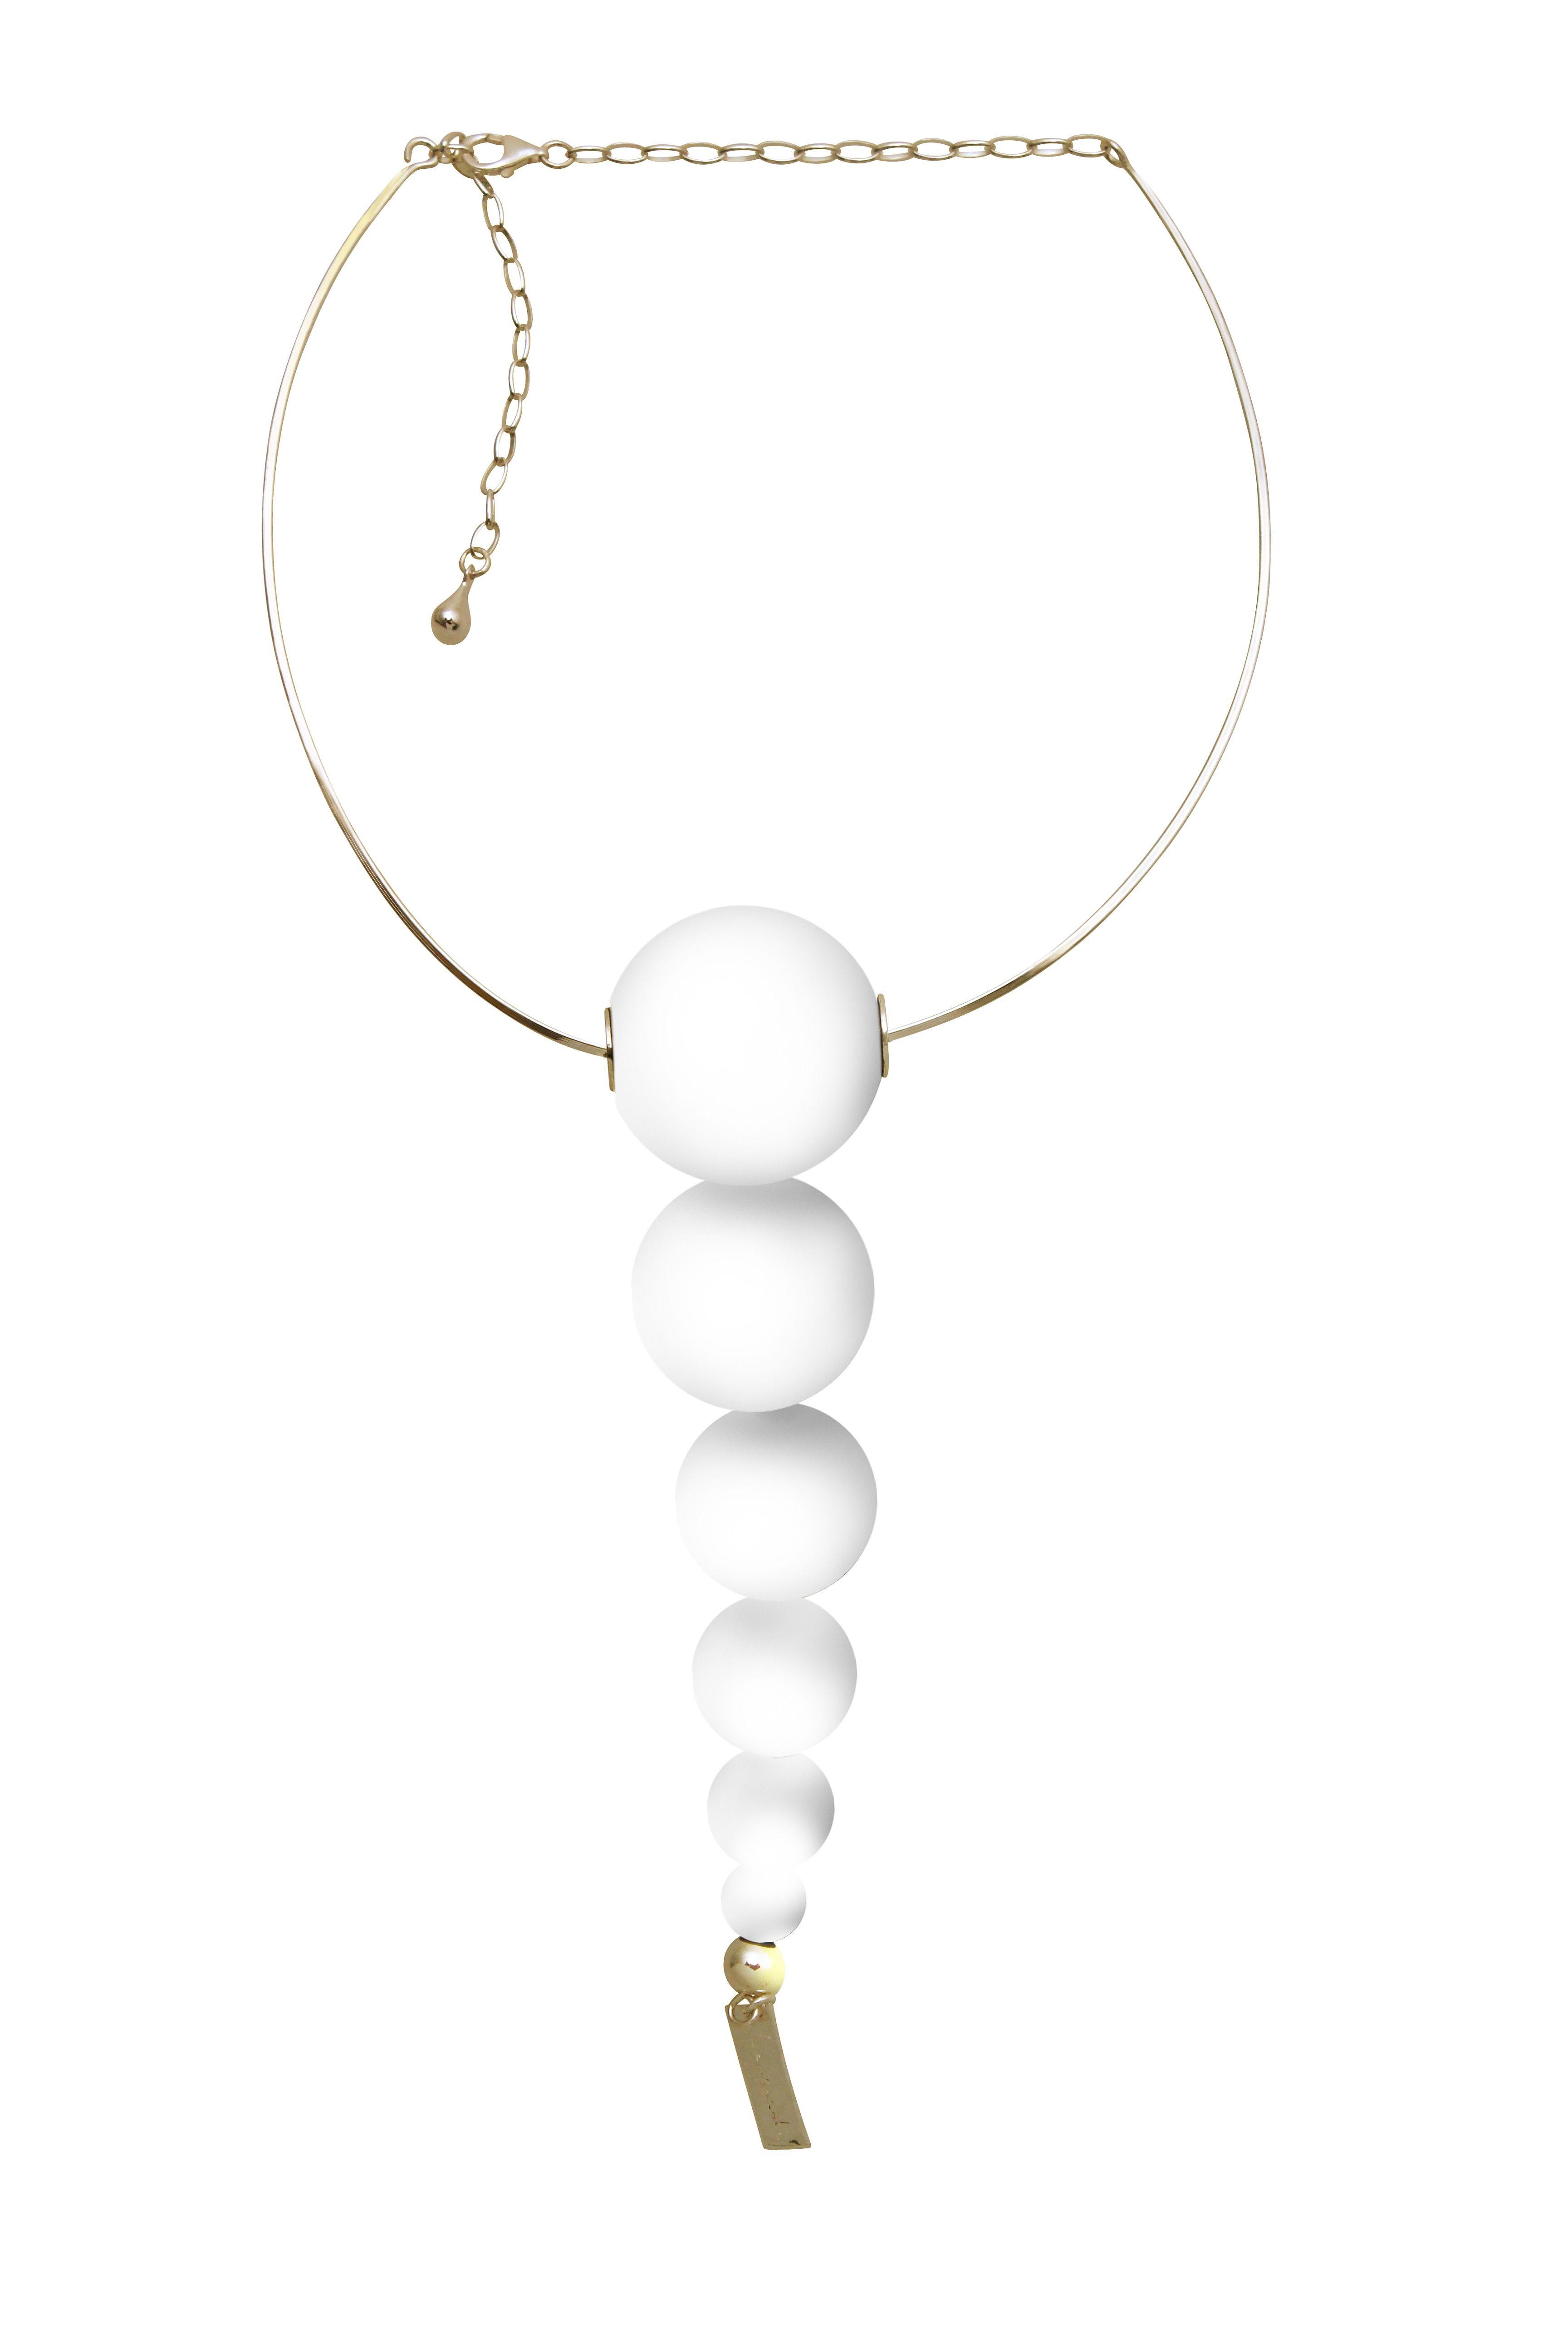 White tie necklace from Langaeble Stockholm. #langaeble #nordicdesigncollective #swedishdesign #swedishfashion #statementjewelry #statement #minimalist #whitejewelry #white #brass #cool #fashionforward #unique #accessories #smycken #svenskasmycken #wood #details #design #nordicdesign #necklace #halsband